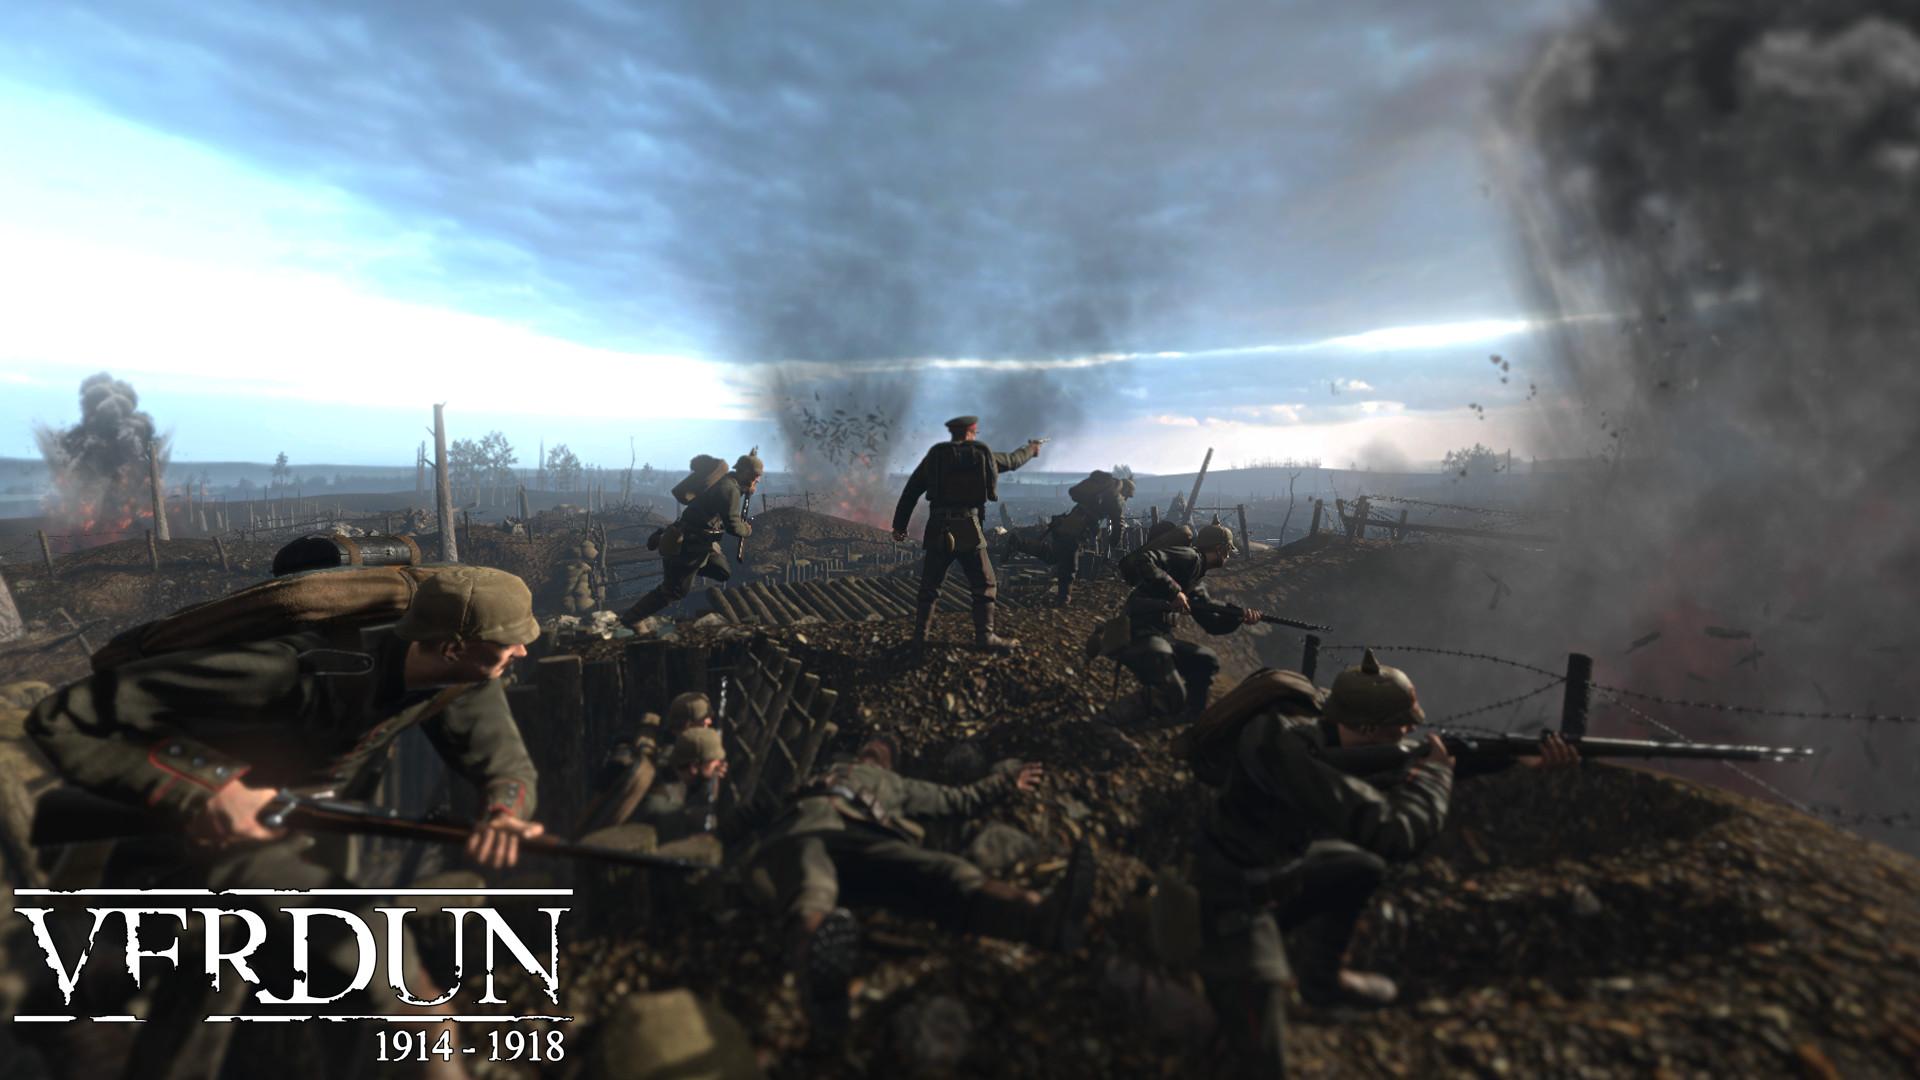 Verdun FPS hardcore sur la WWI Ss_bba495d434a53719c0ff80b77f179c09979e8a09.1920x1080